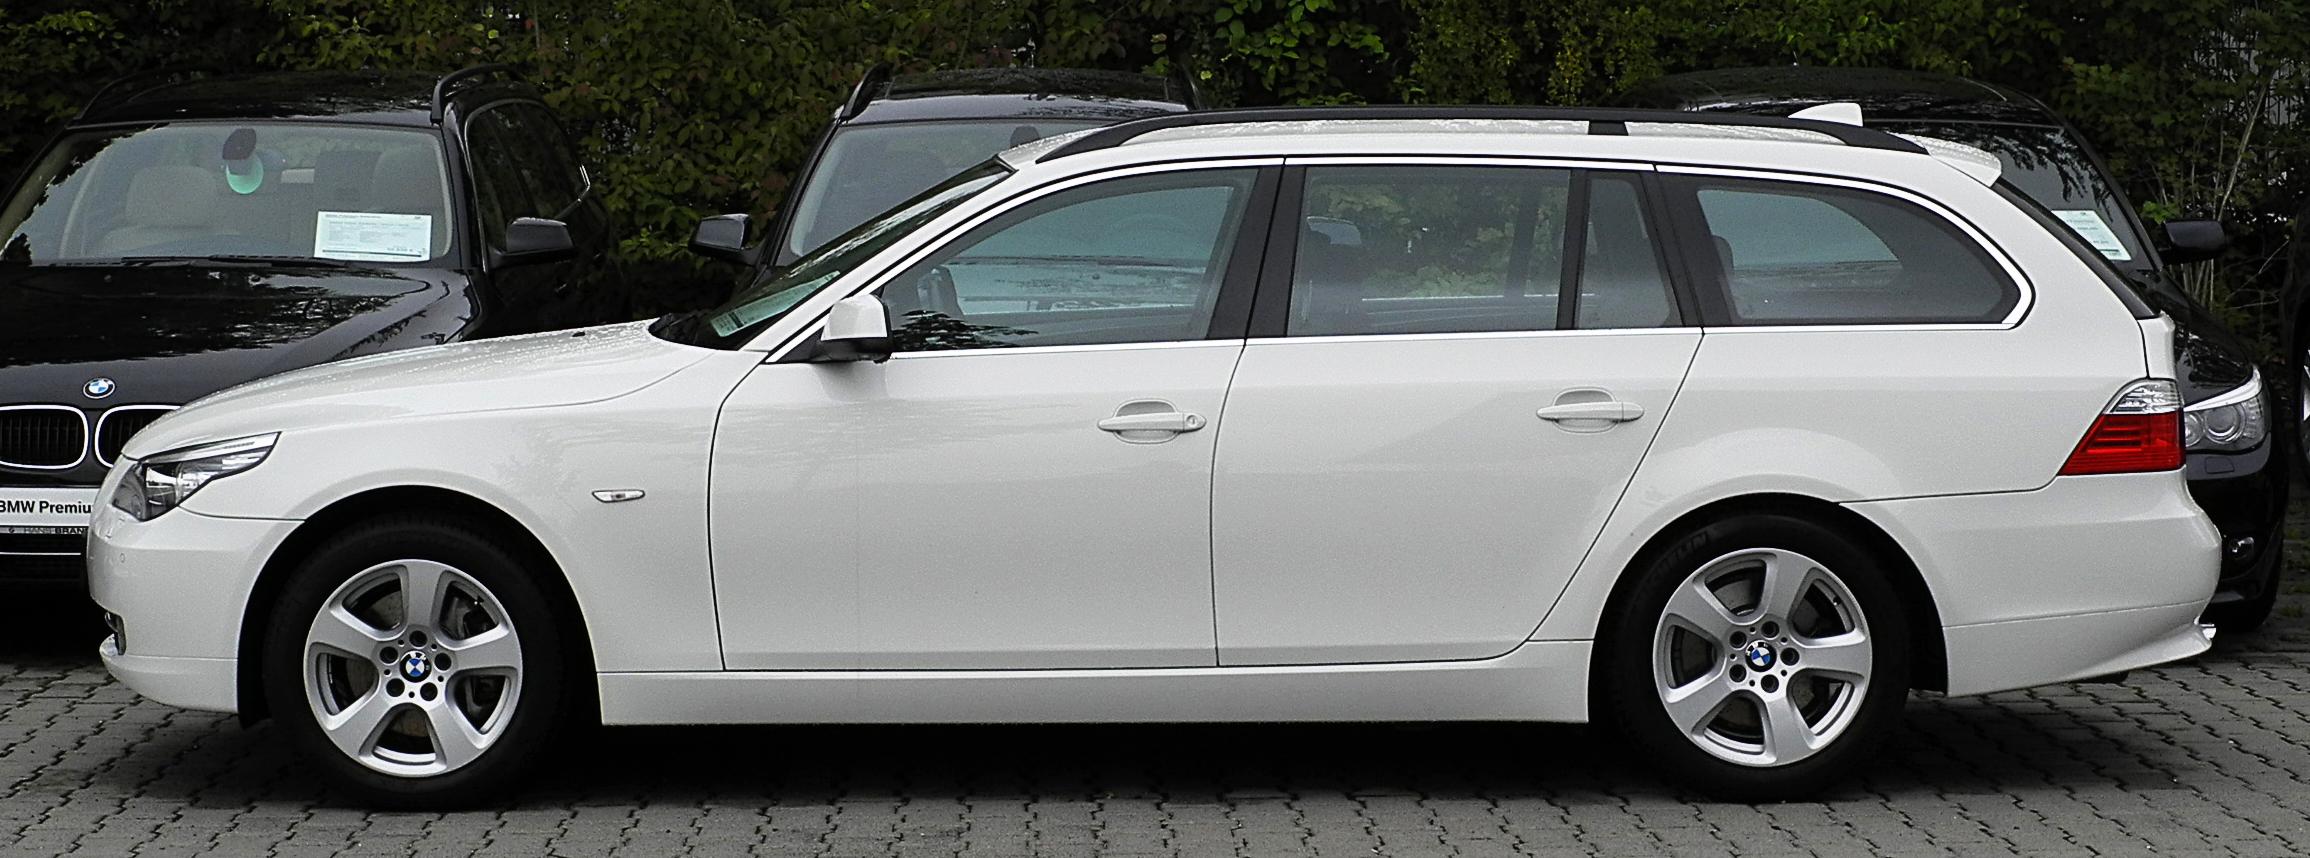 File bmw 525d xdrive touring e61 facelift seitenansicht 26